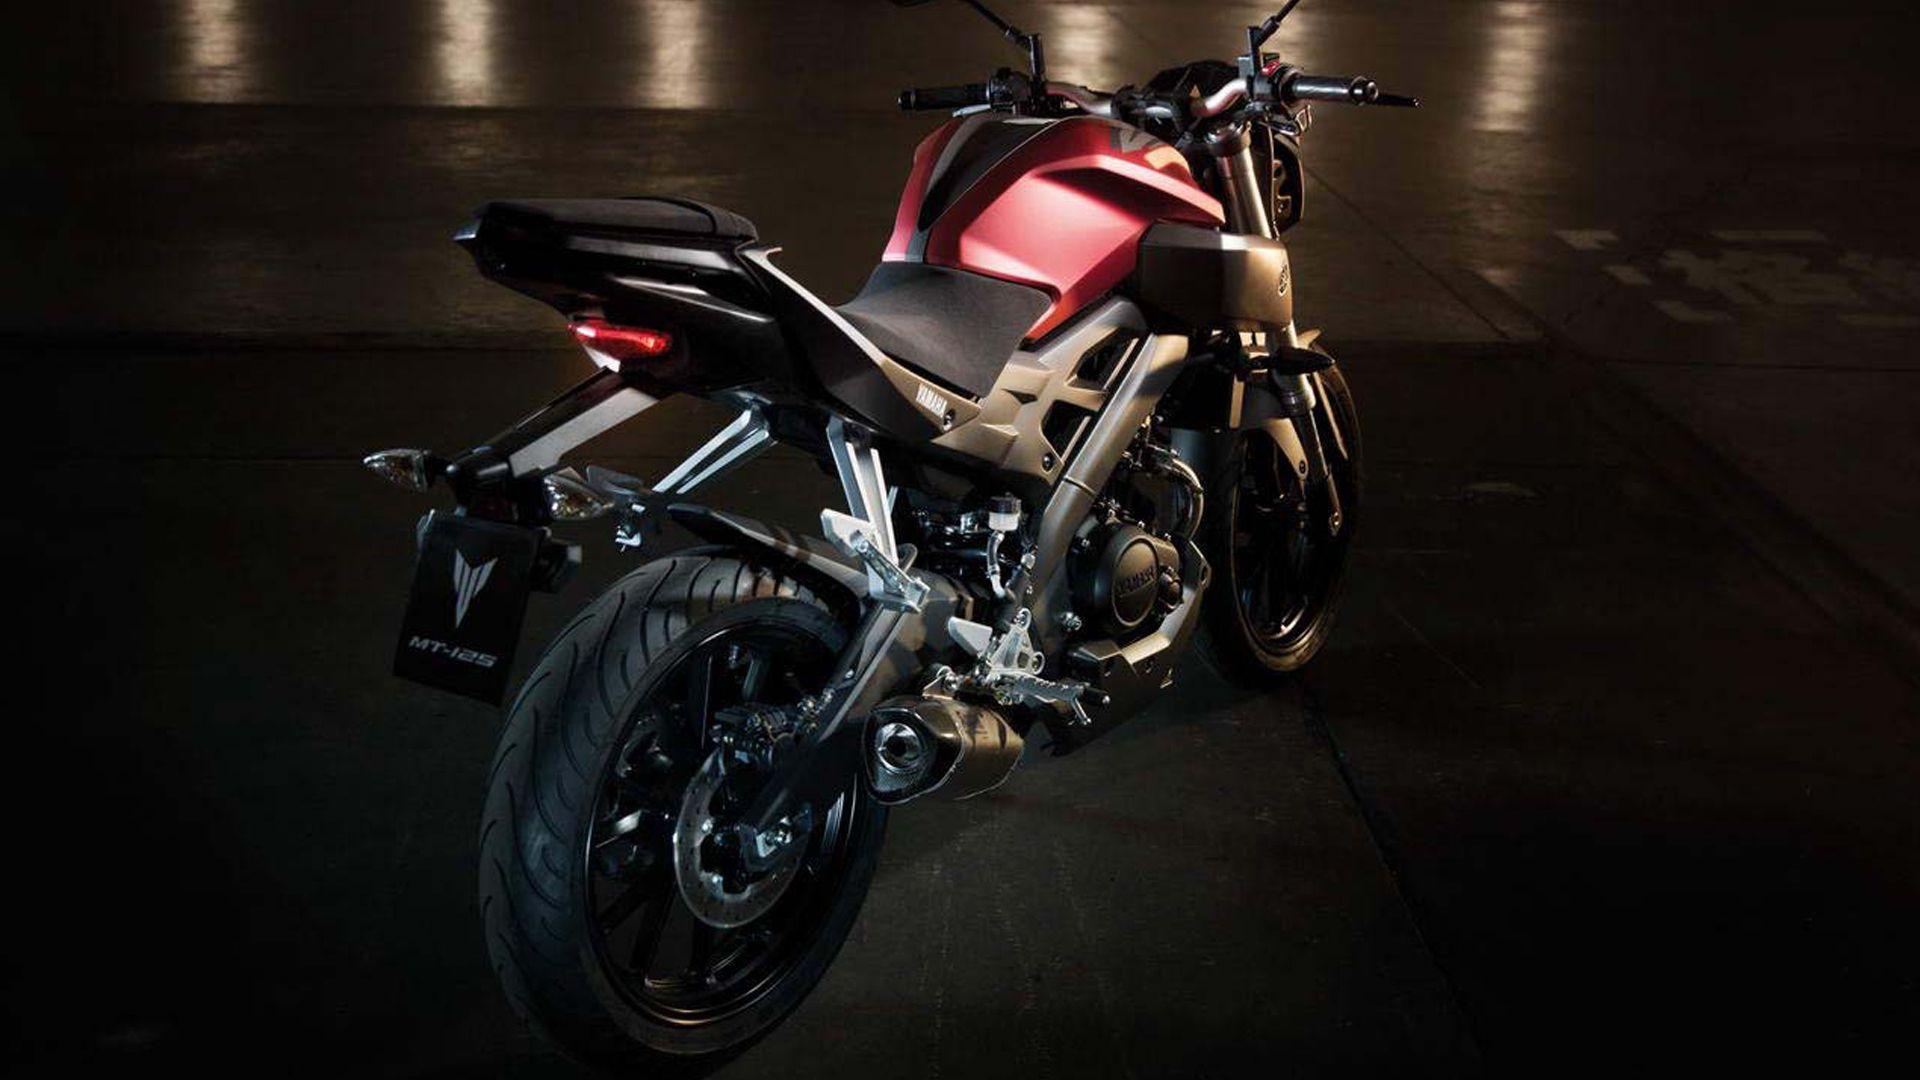 Pin auf motorcycles